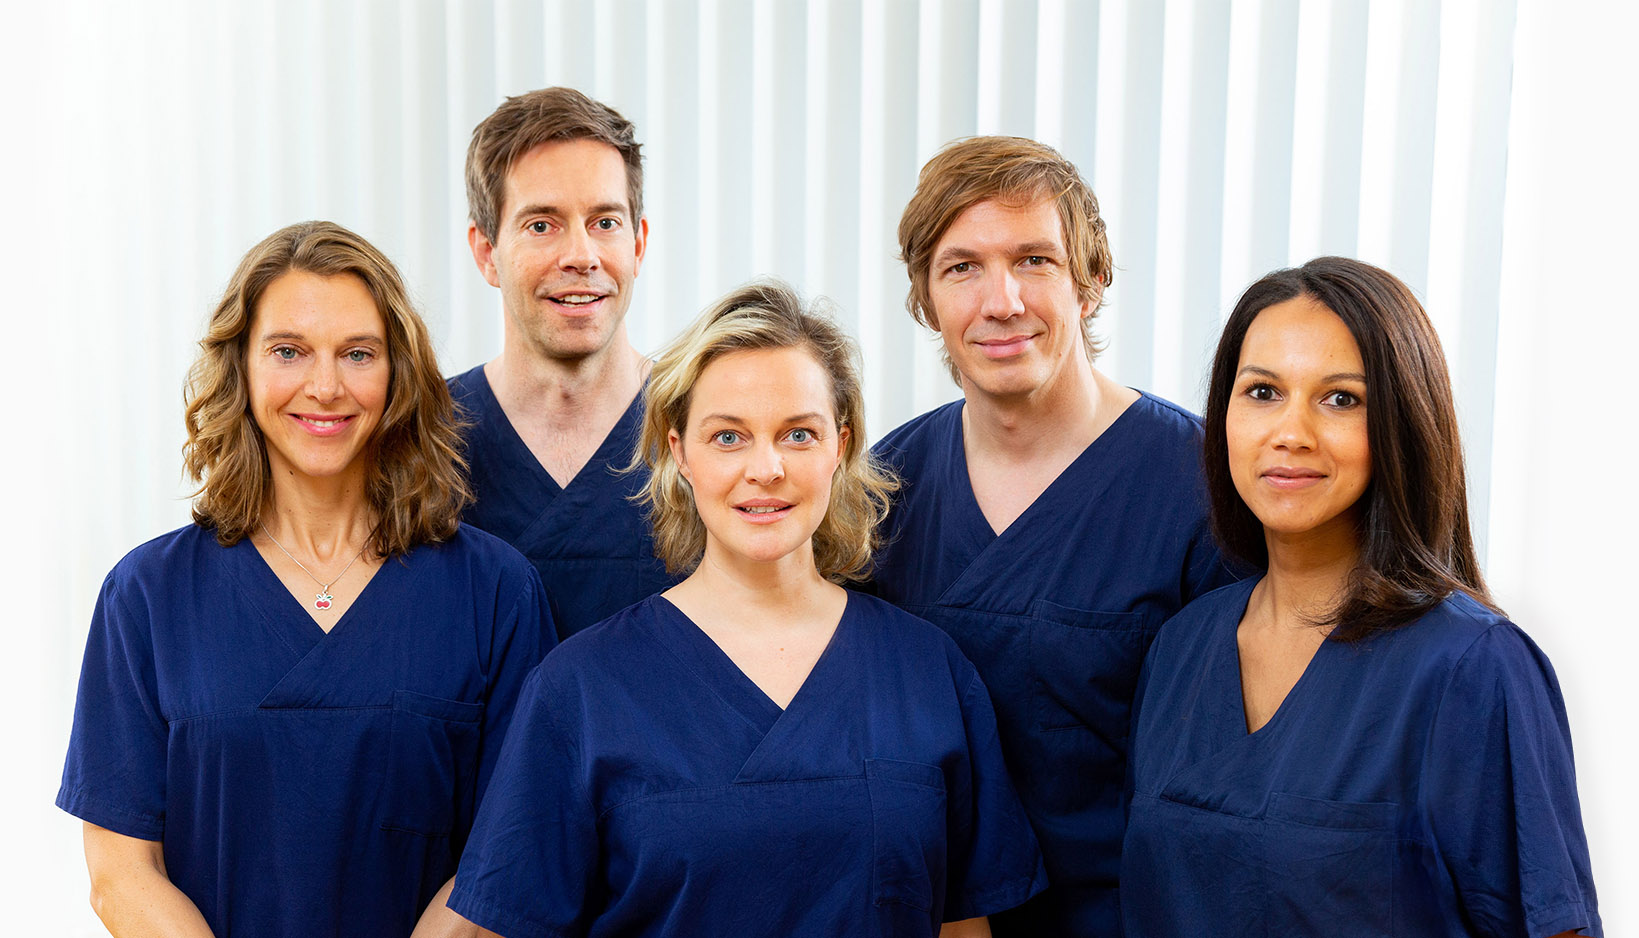 chirurgiens plasticiens